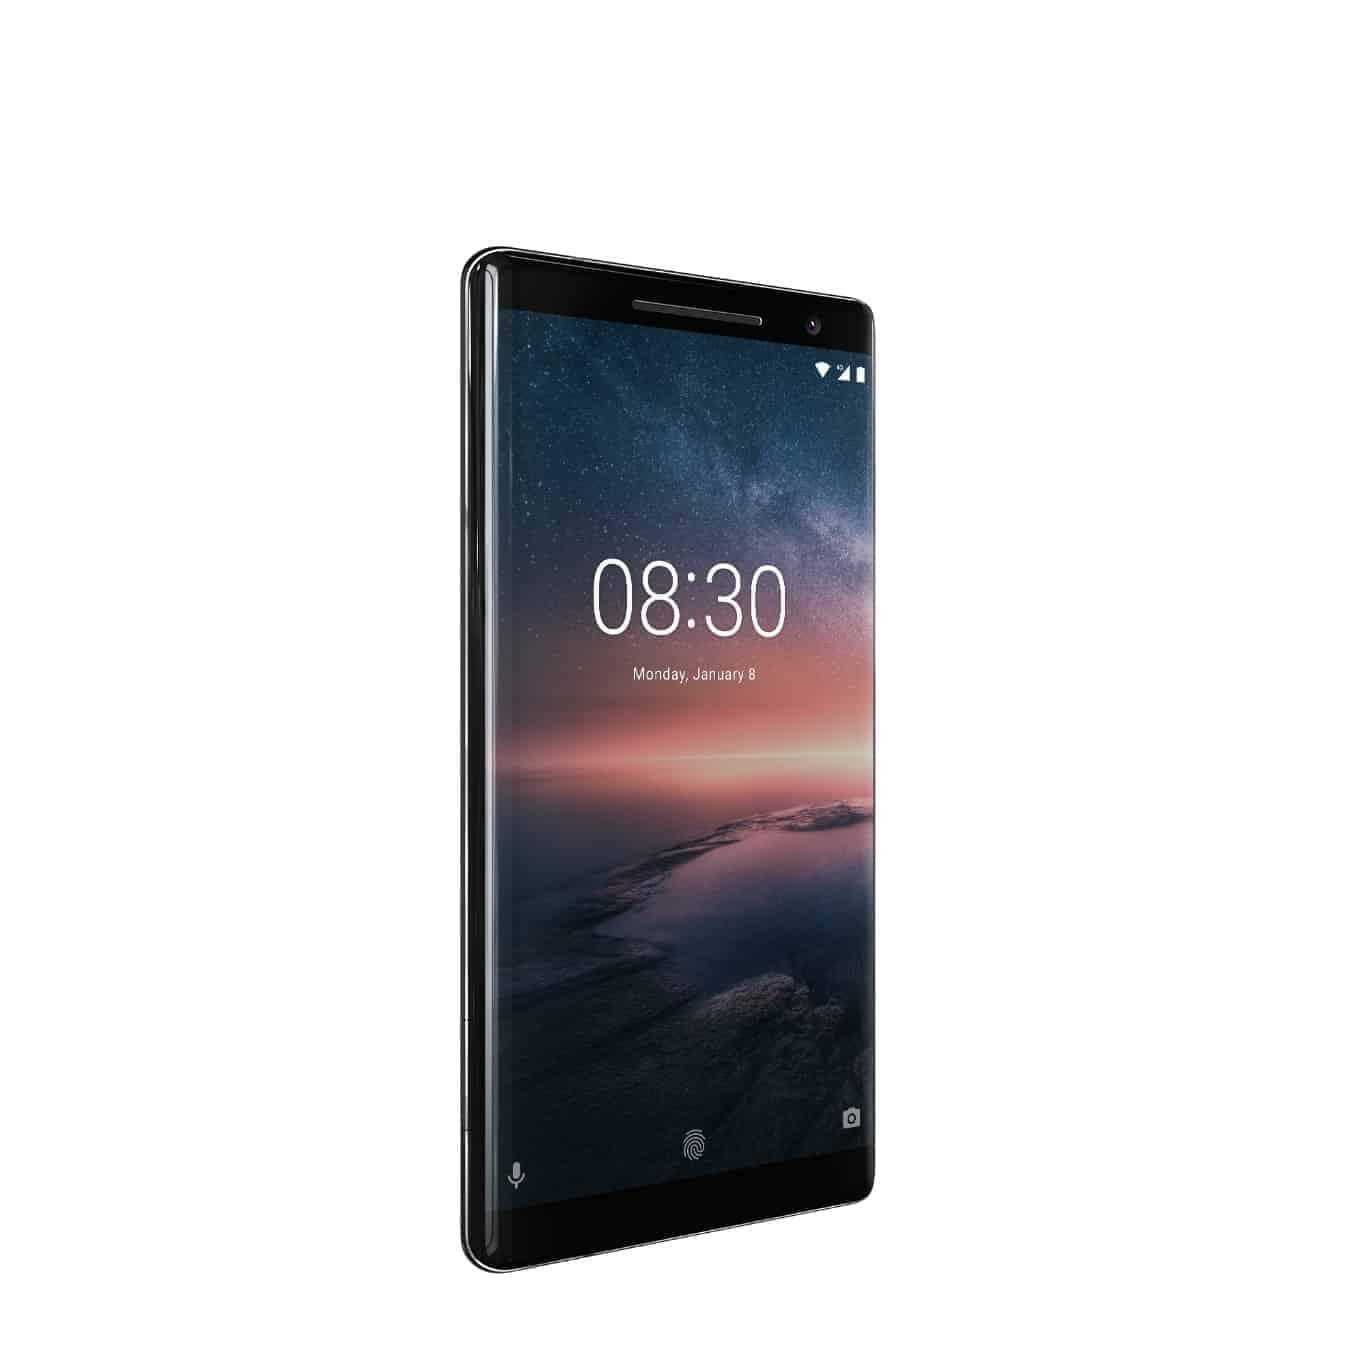 Nokia 8 Sirocco image 2